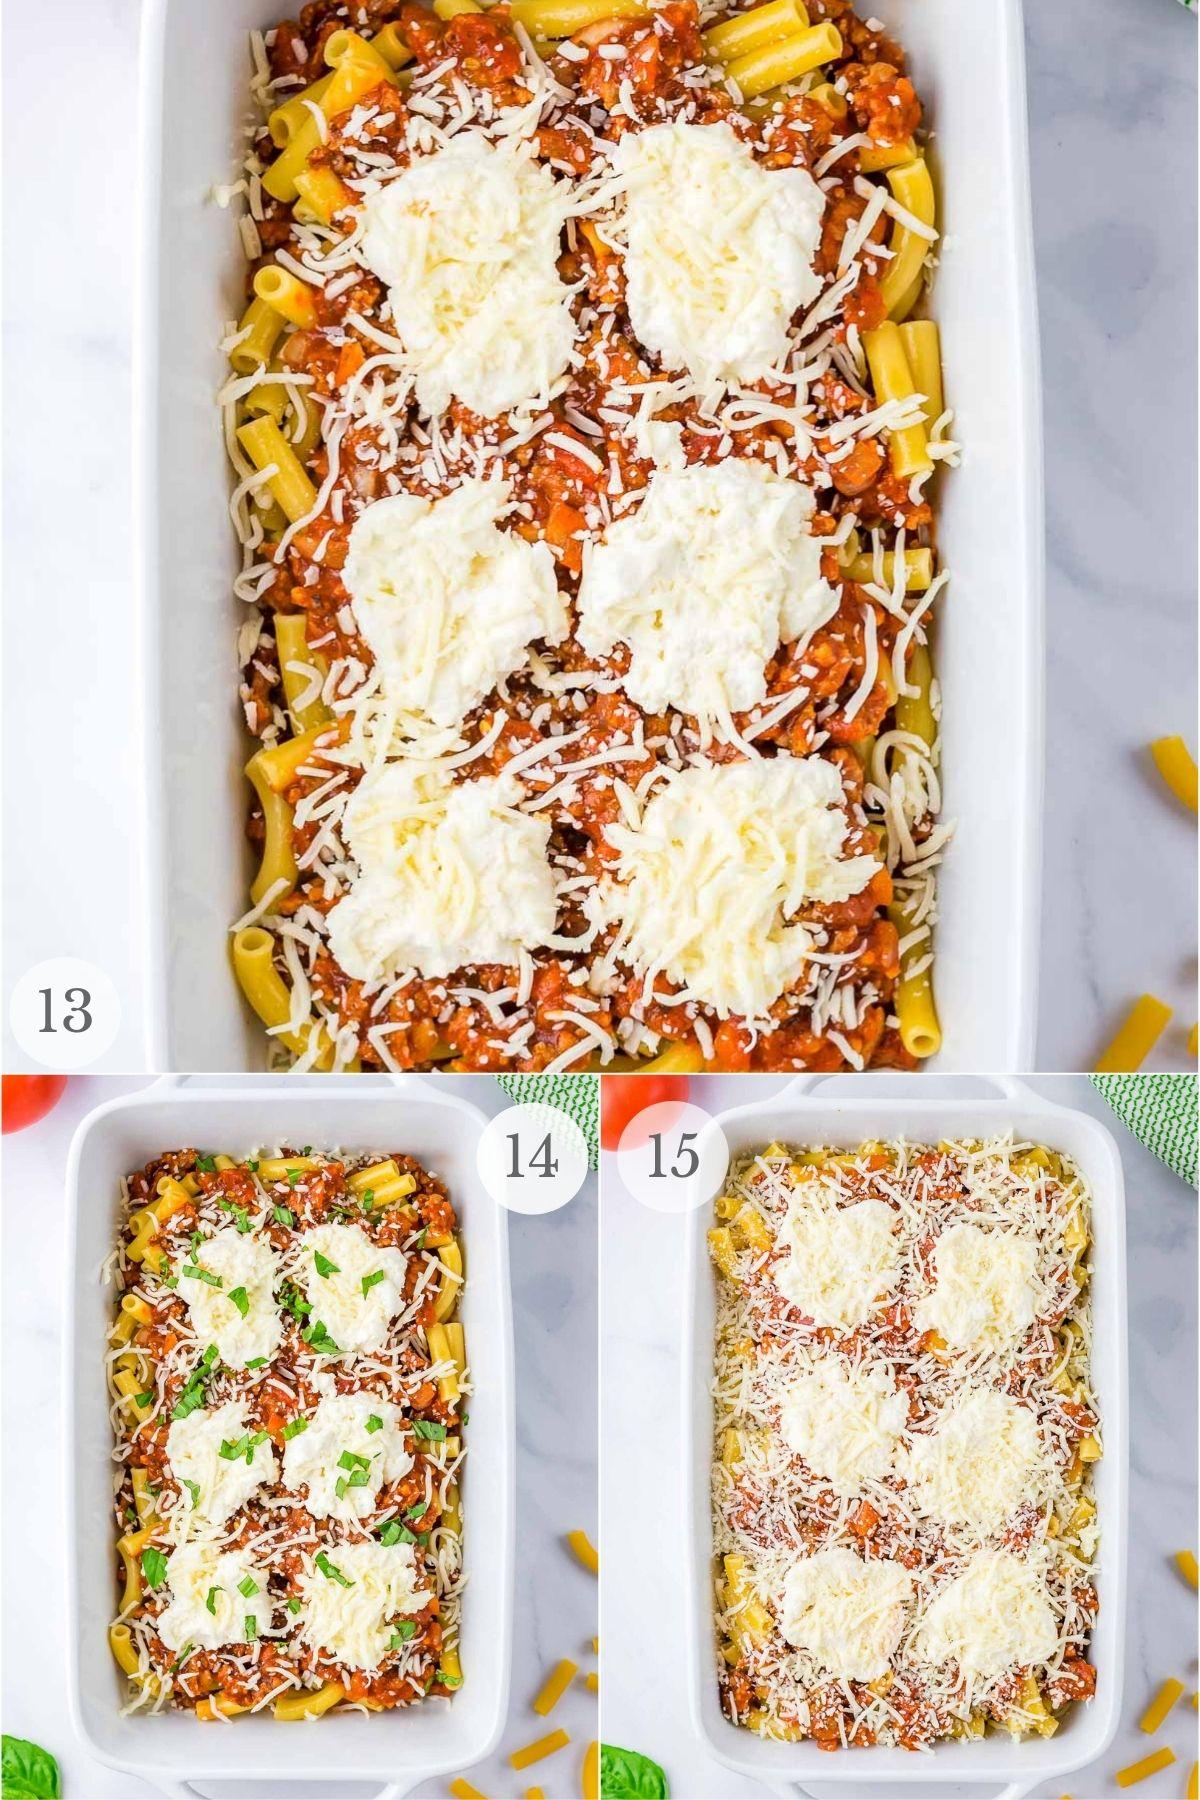 baked ziti recipe steps 13-15